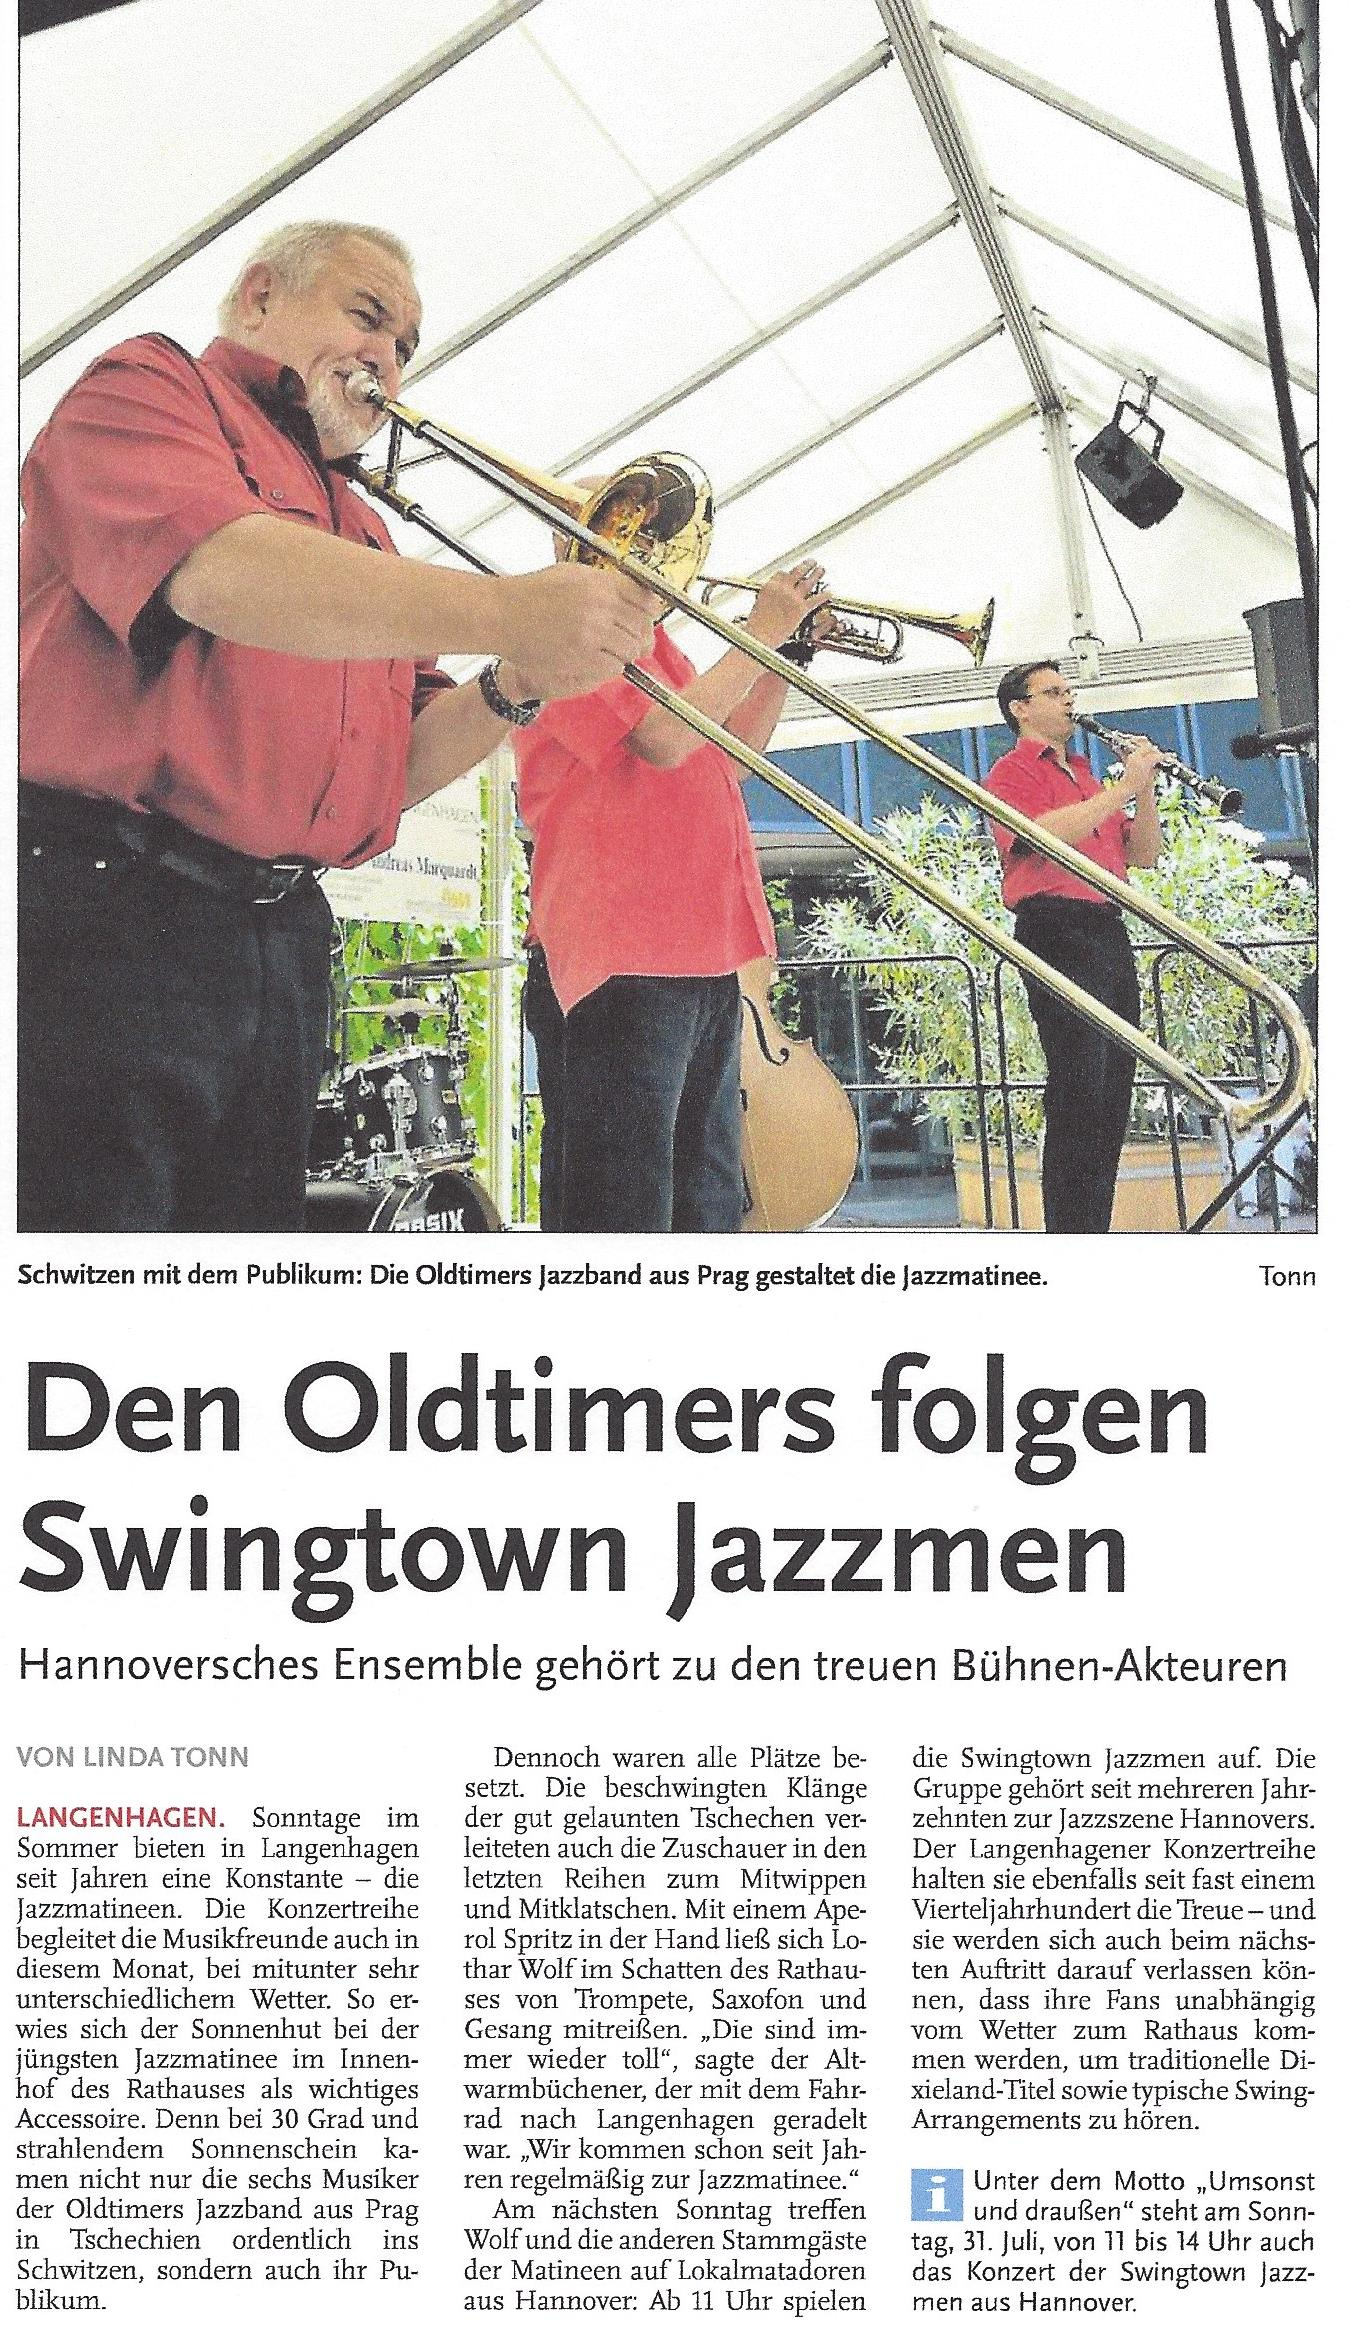 Den Oldtimers folgen Swingtown Jazzmen